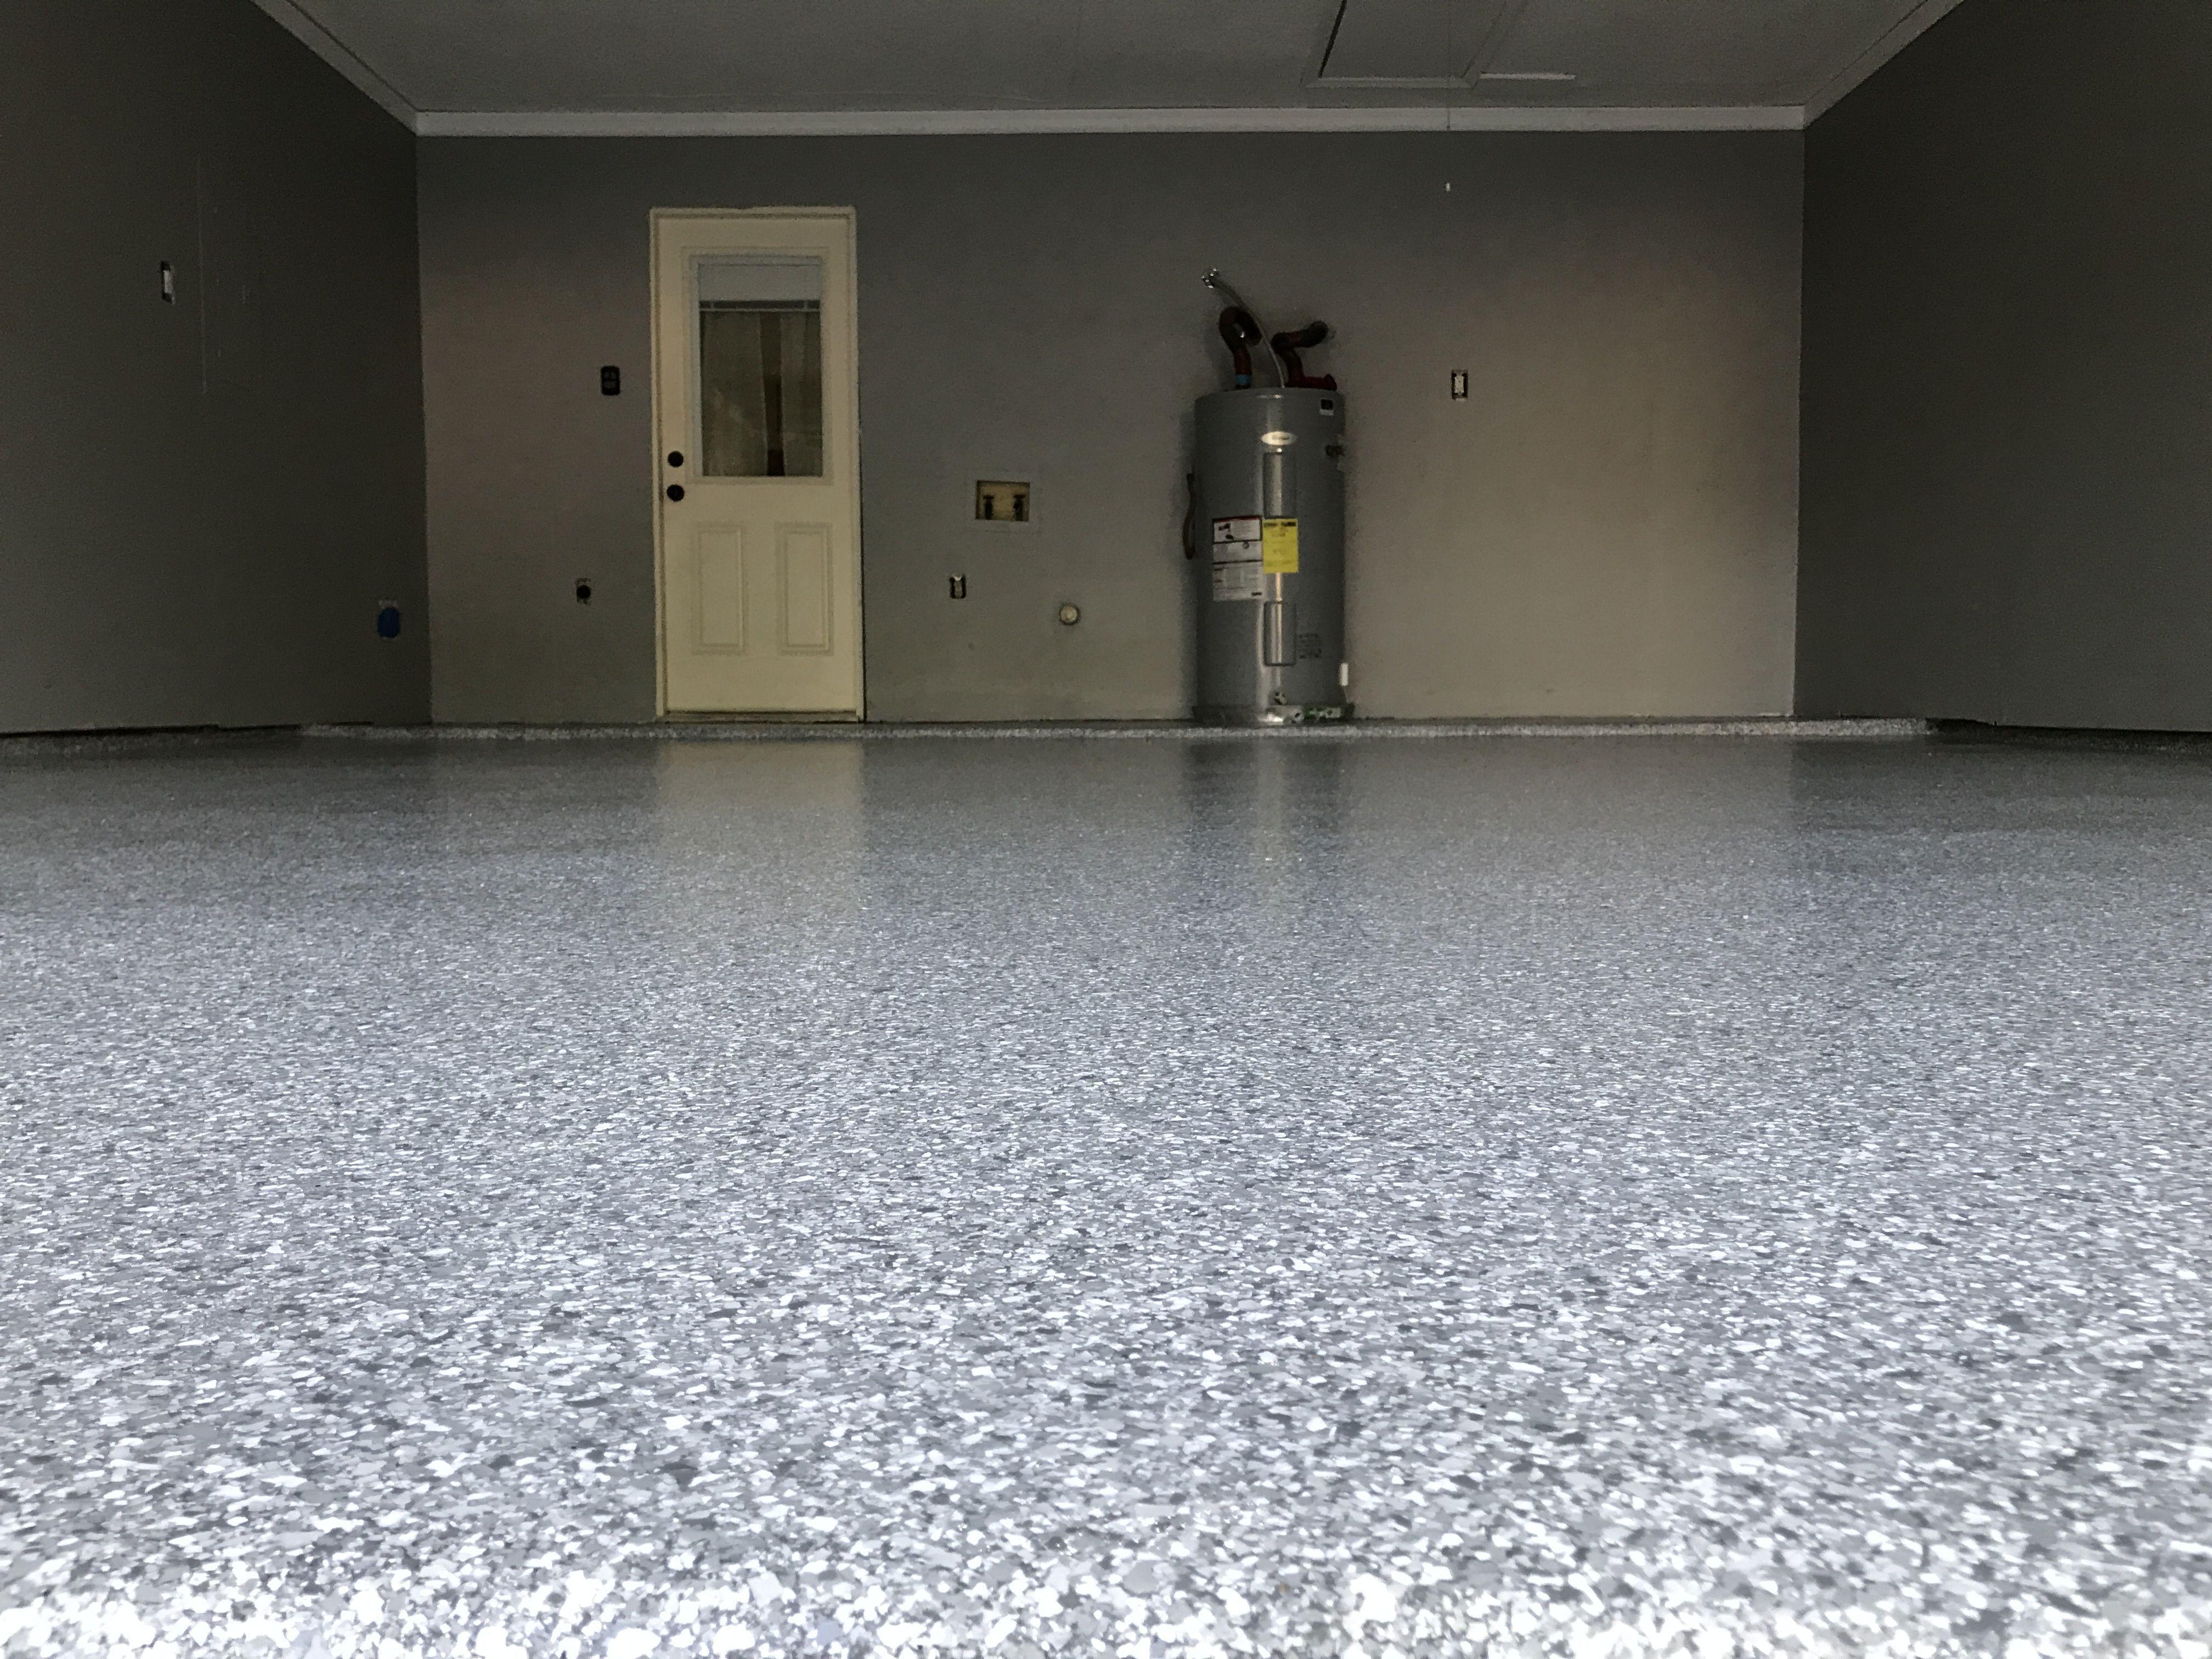 50 Year Old Garage Floor Looking New Epoxy Polyaspartic Garage Floor Coating Texas Fort W Garage Floor Flooring Contractor Epoxy Garage Floor Coating